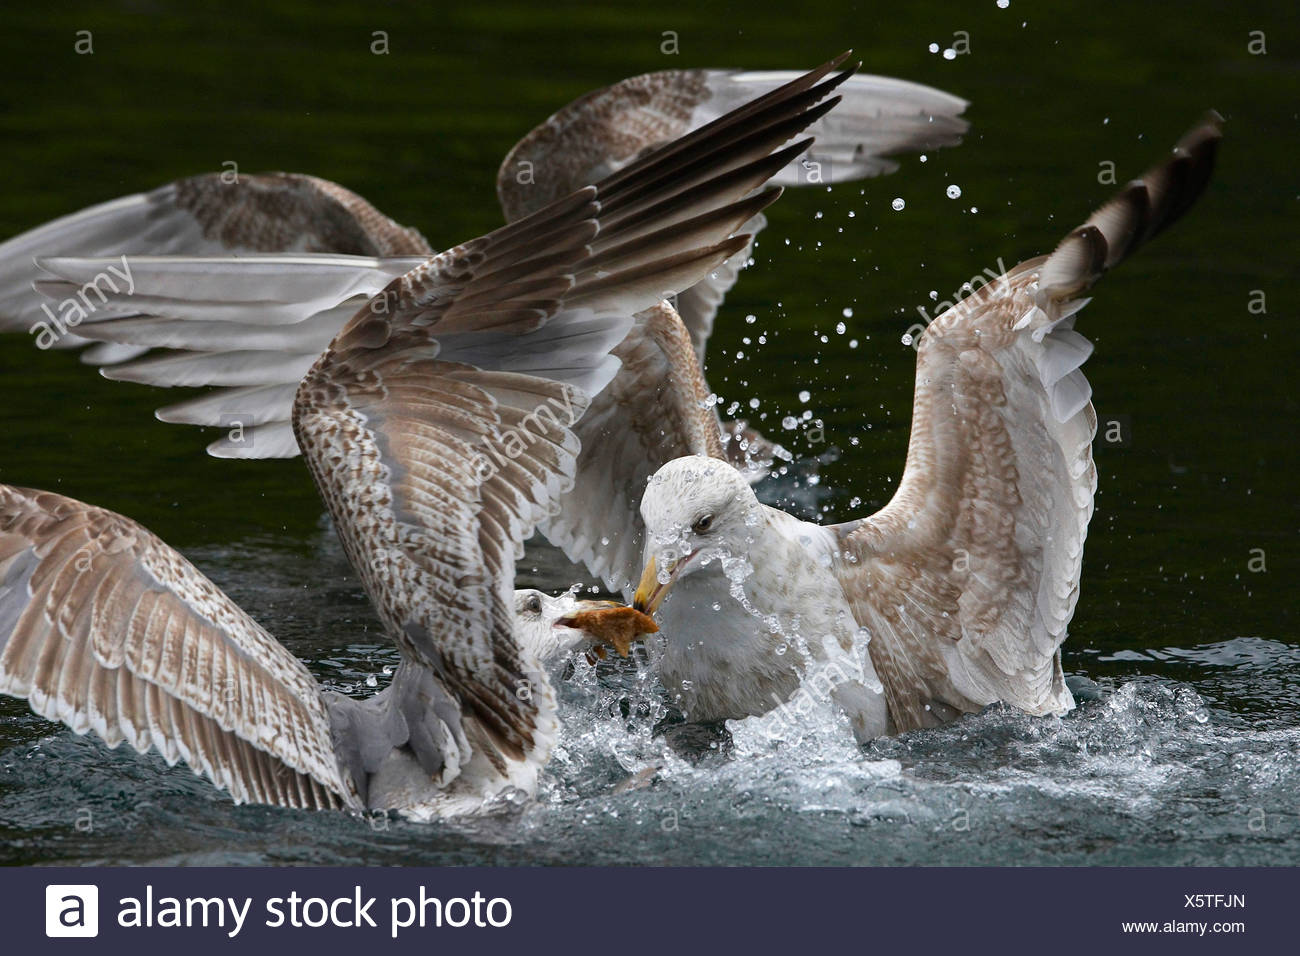 herring gull (Larus argentatus), two young birds fighting for prey, Norway, Trondelag, Flatanger, Lauvsnes - Stock Image